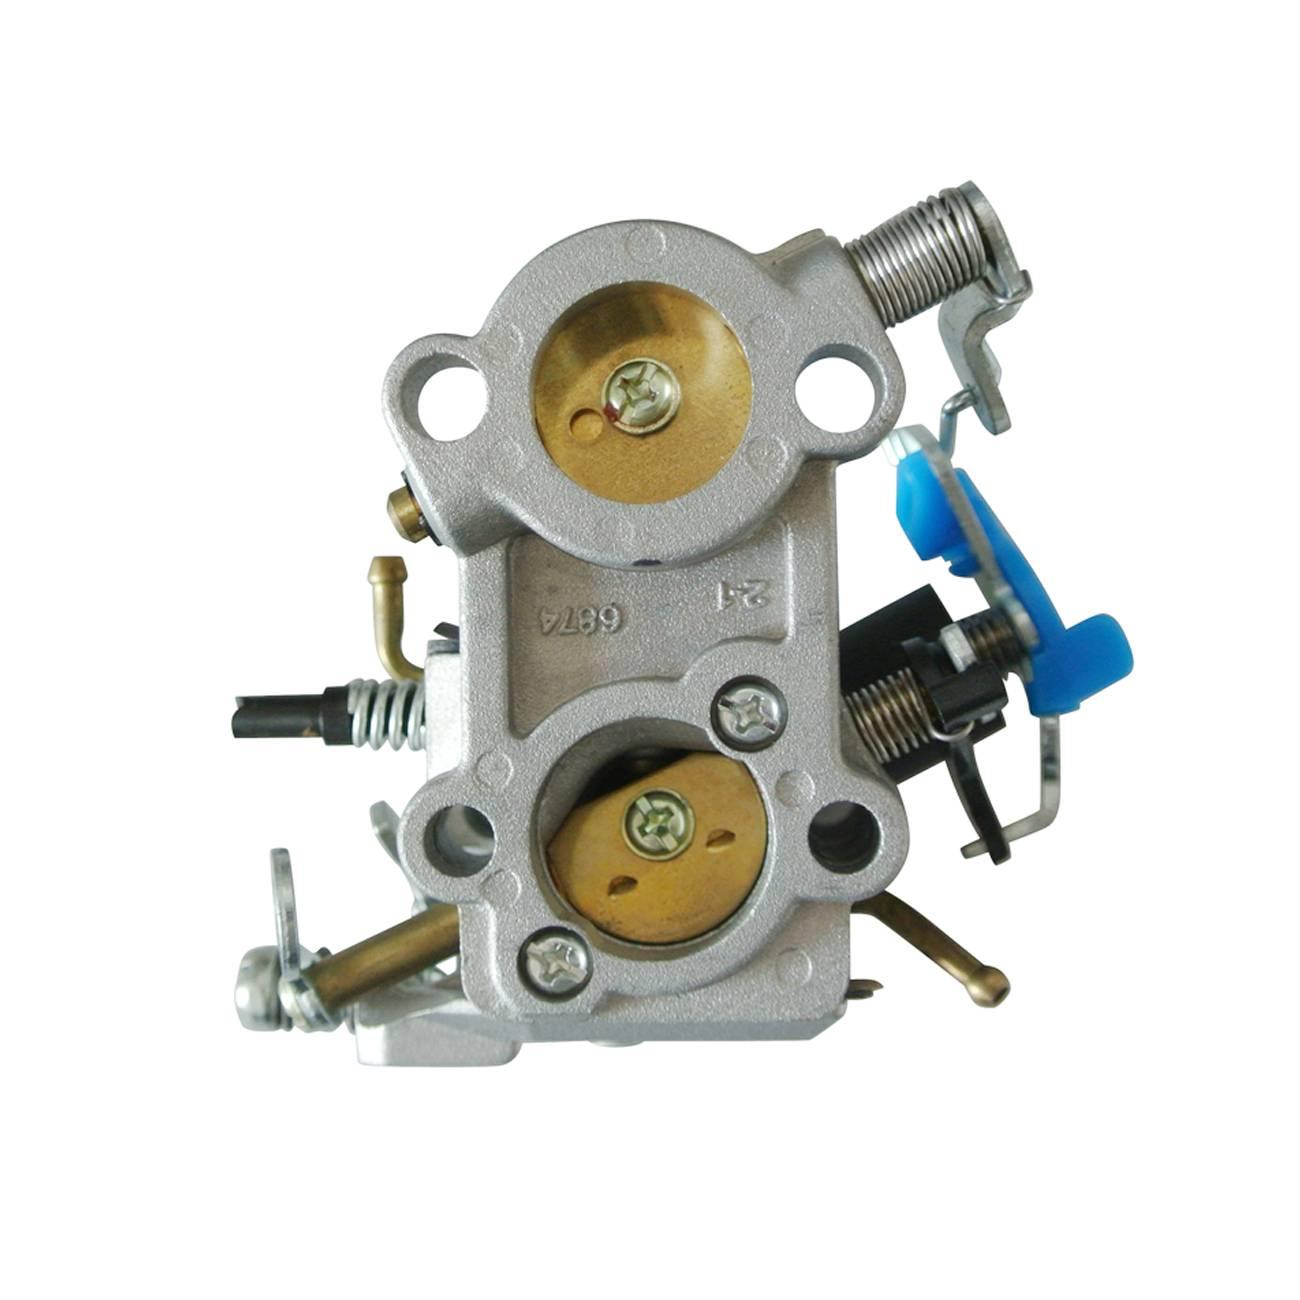 New Walbro Carb Carburetor For Husqvarna Chainsaw 455 460 Rancher